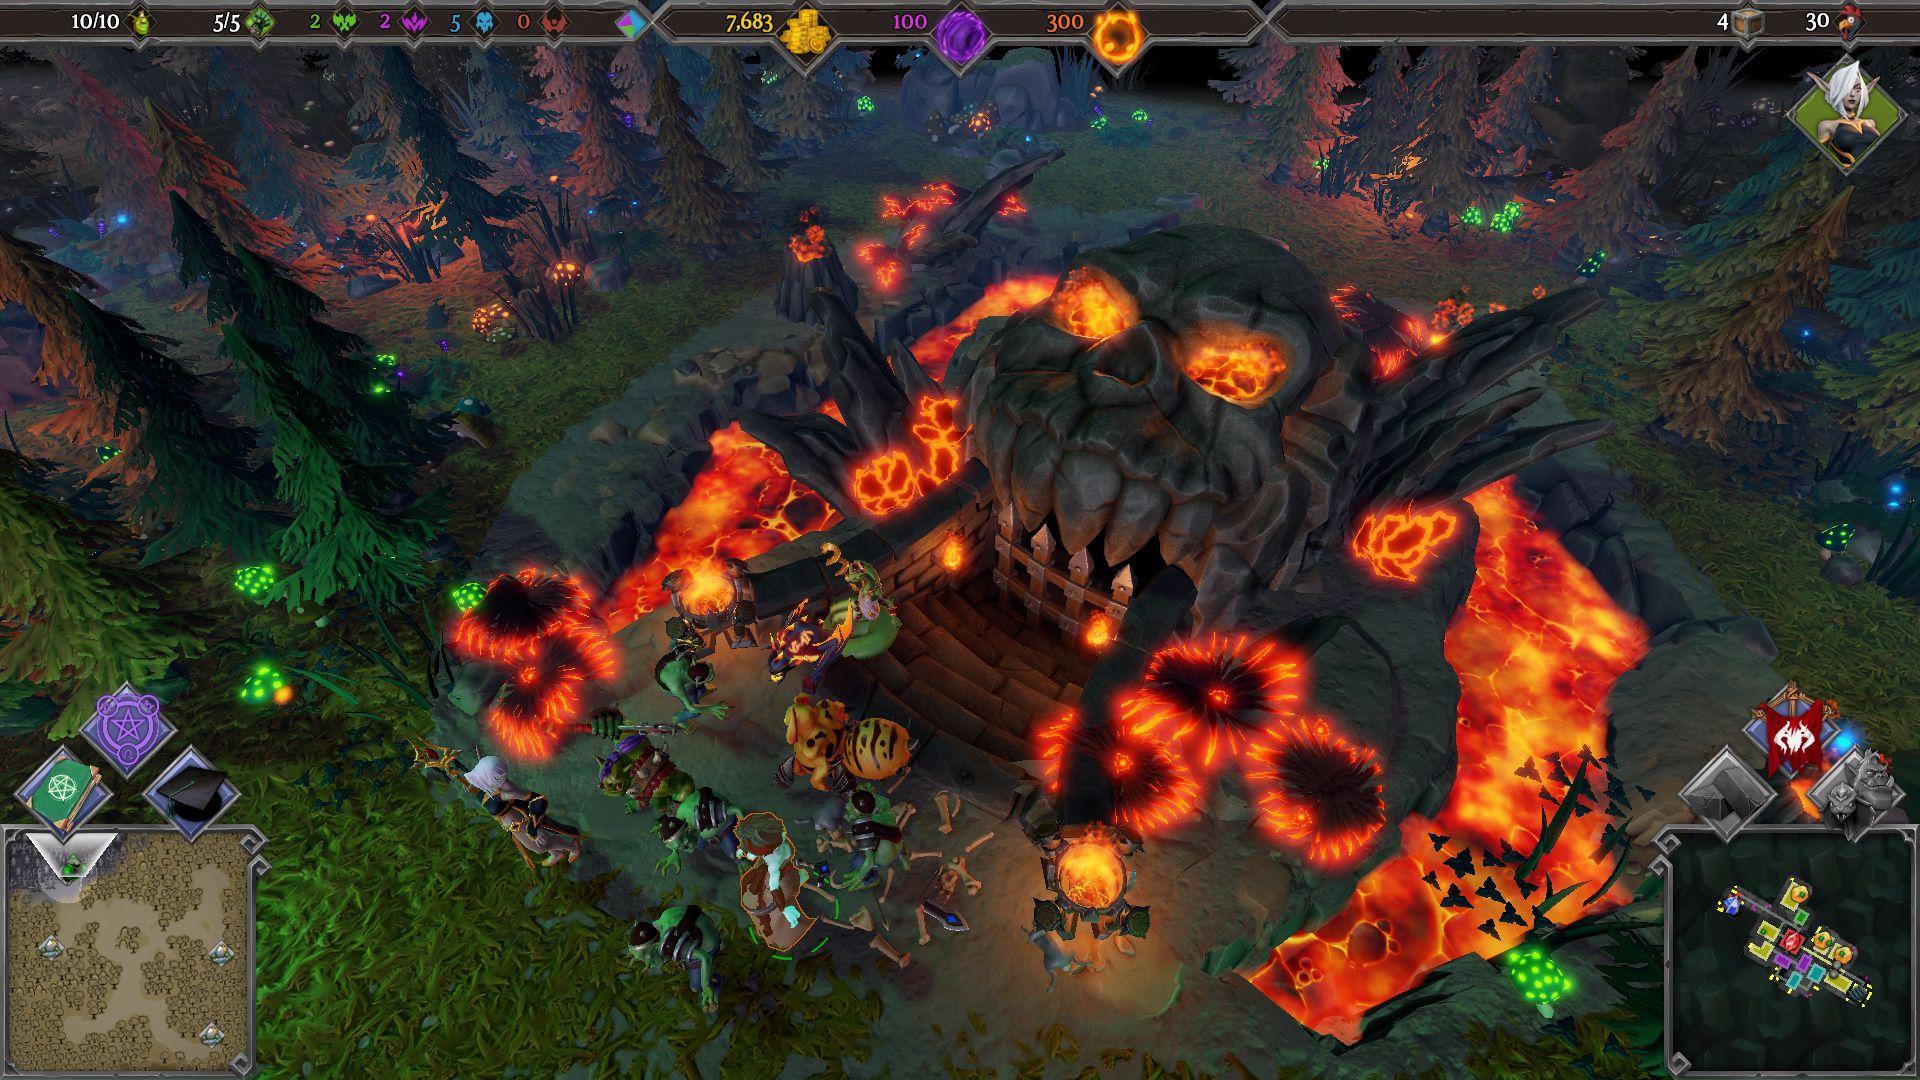 Dungeon 3 Screenshot 1